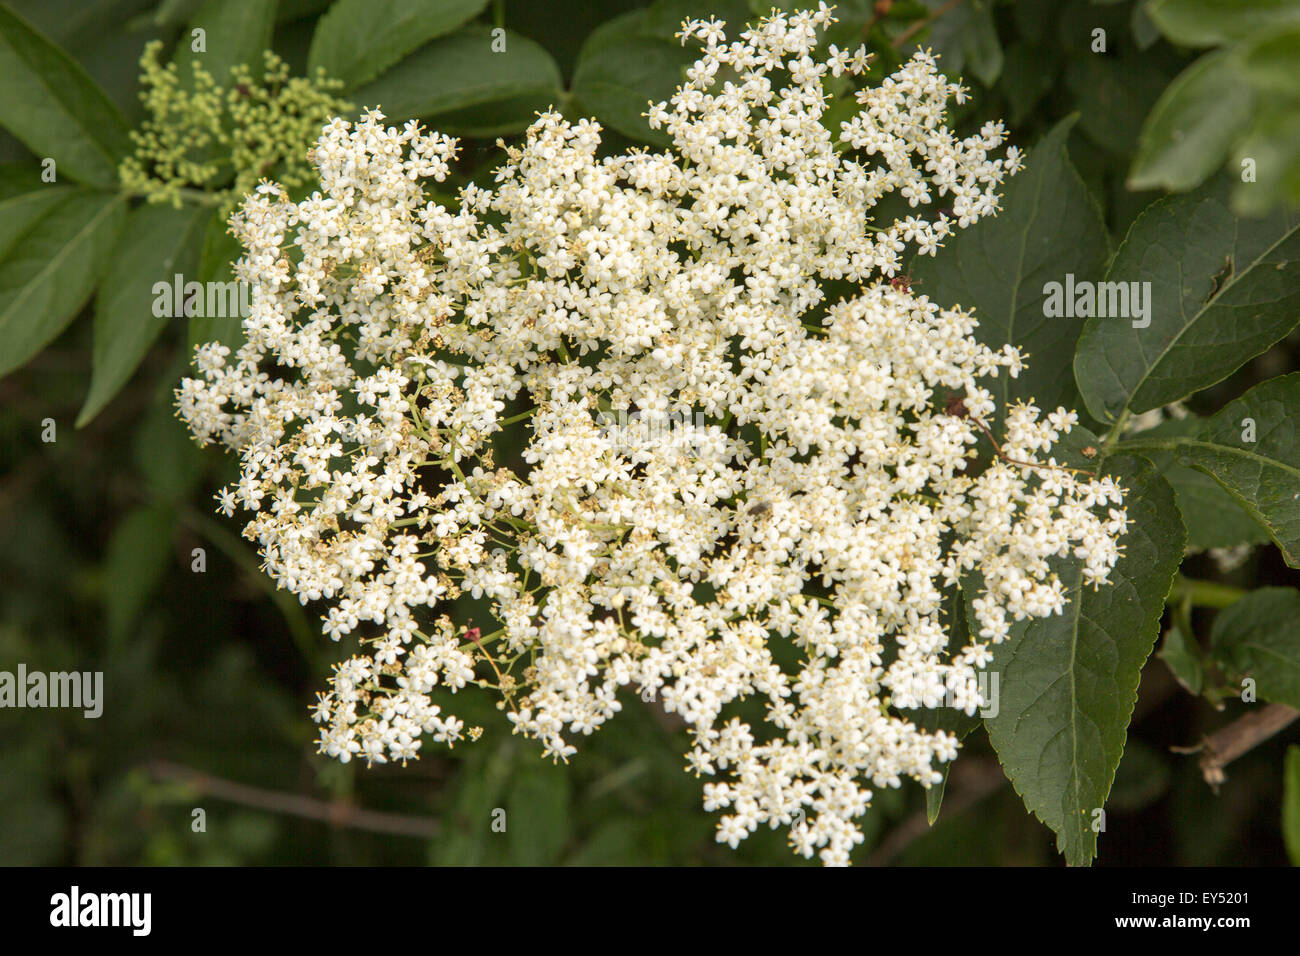 Close up of flowers of European elder tree, Sambucus nigra, Suffolk, England, UK - Stock Image